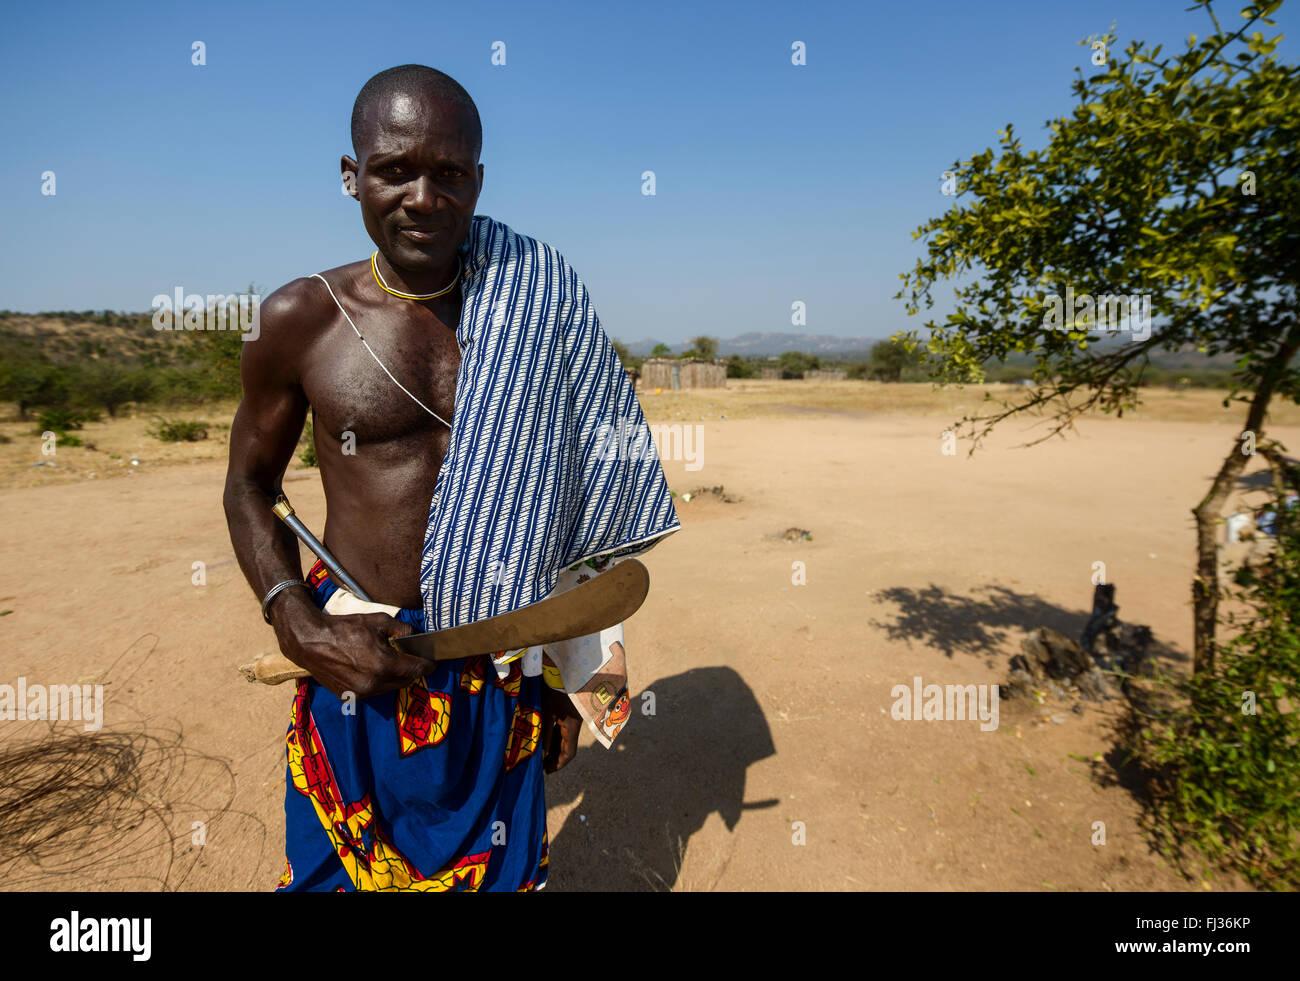 Tribal people of Angola, Africa - Stock Image